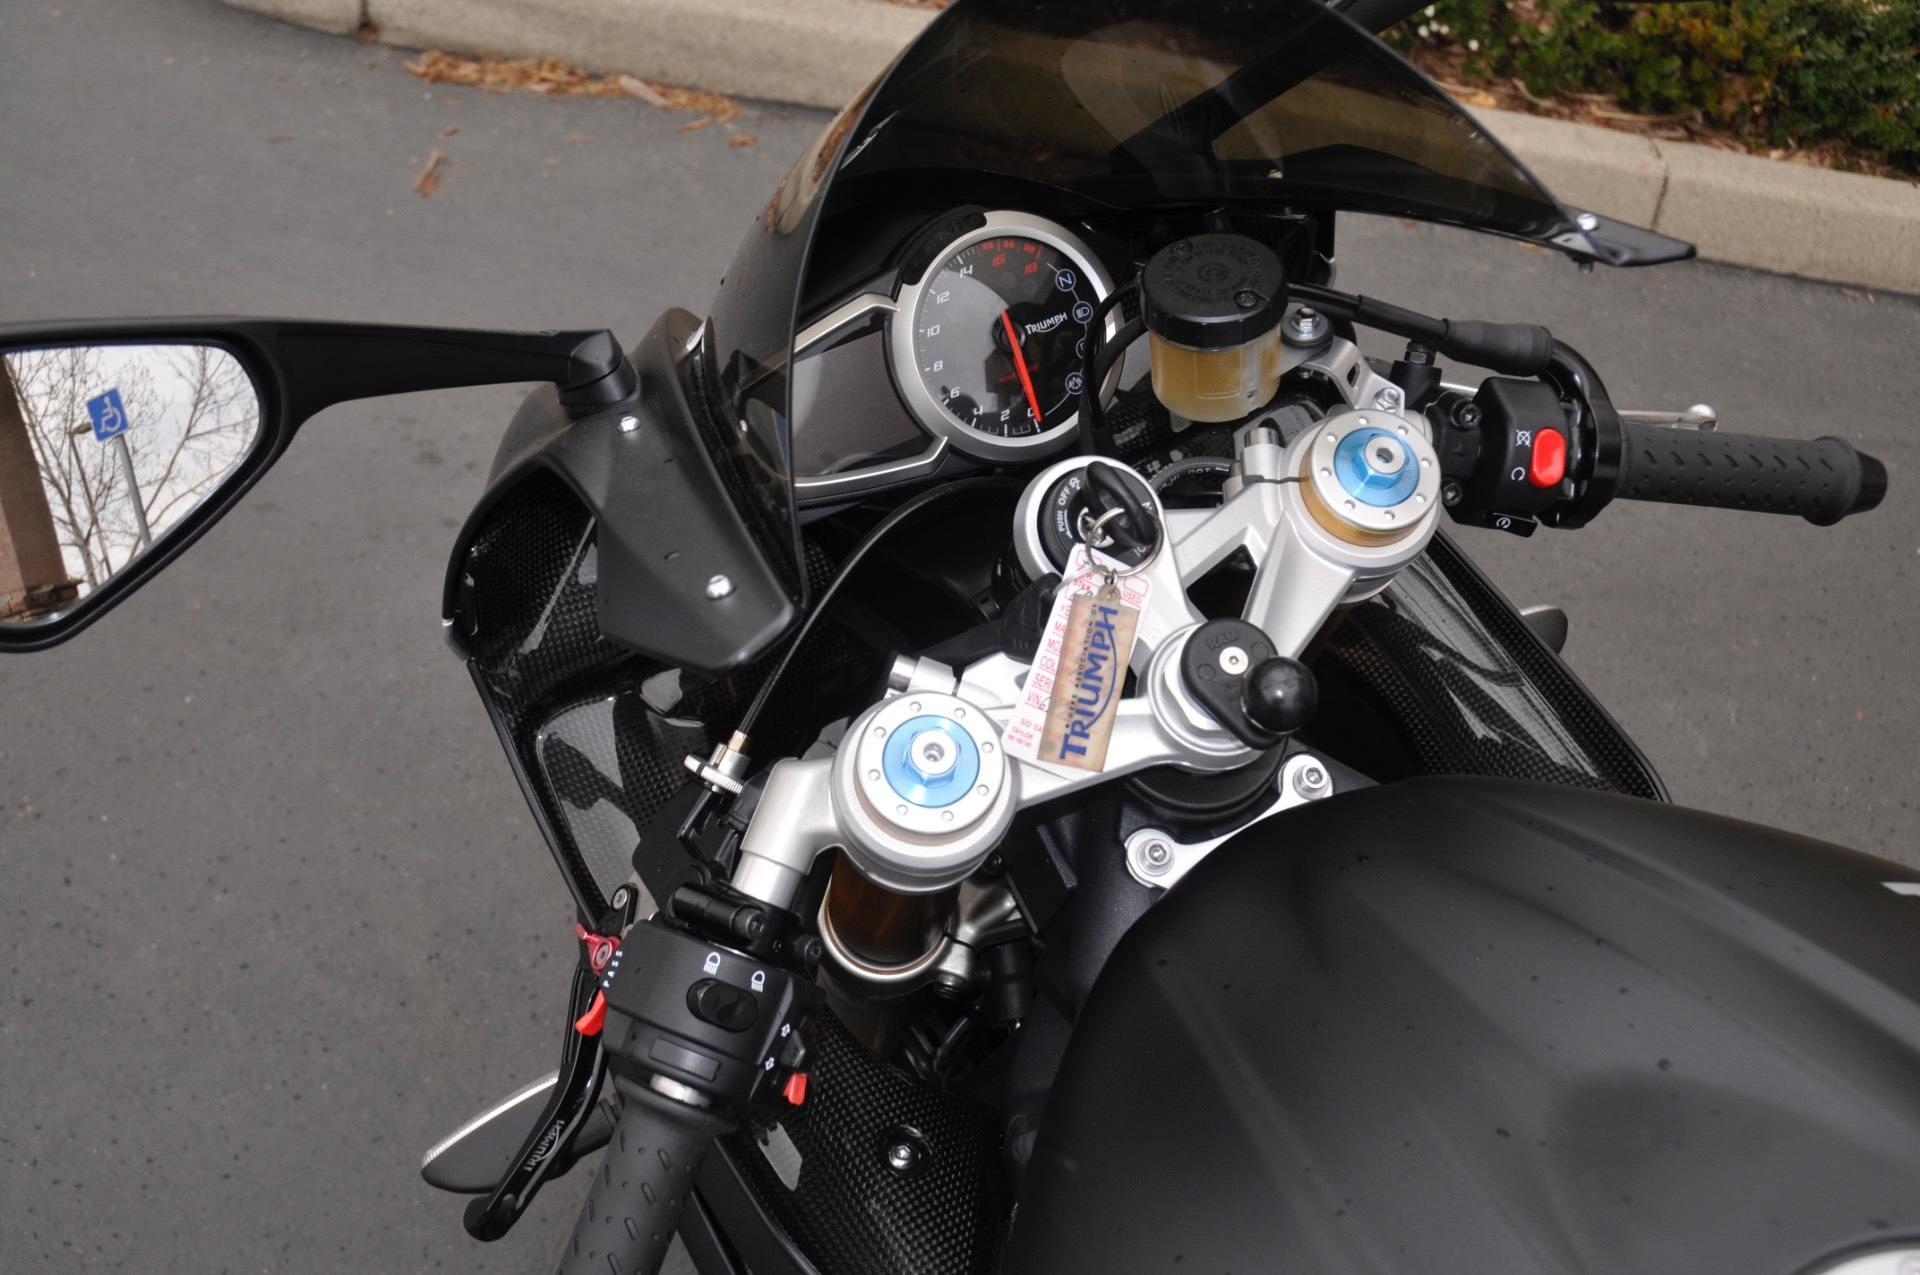 2015 Triumph Daytona 675R ABS in Roseville, California